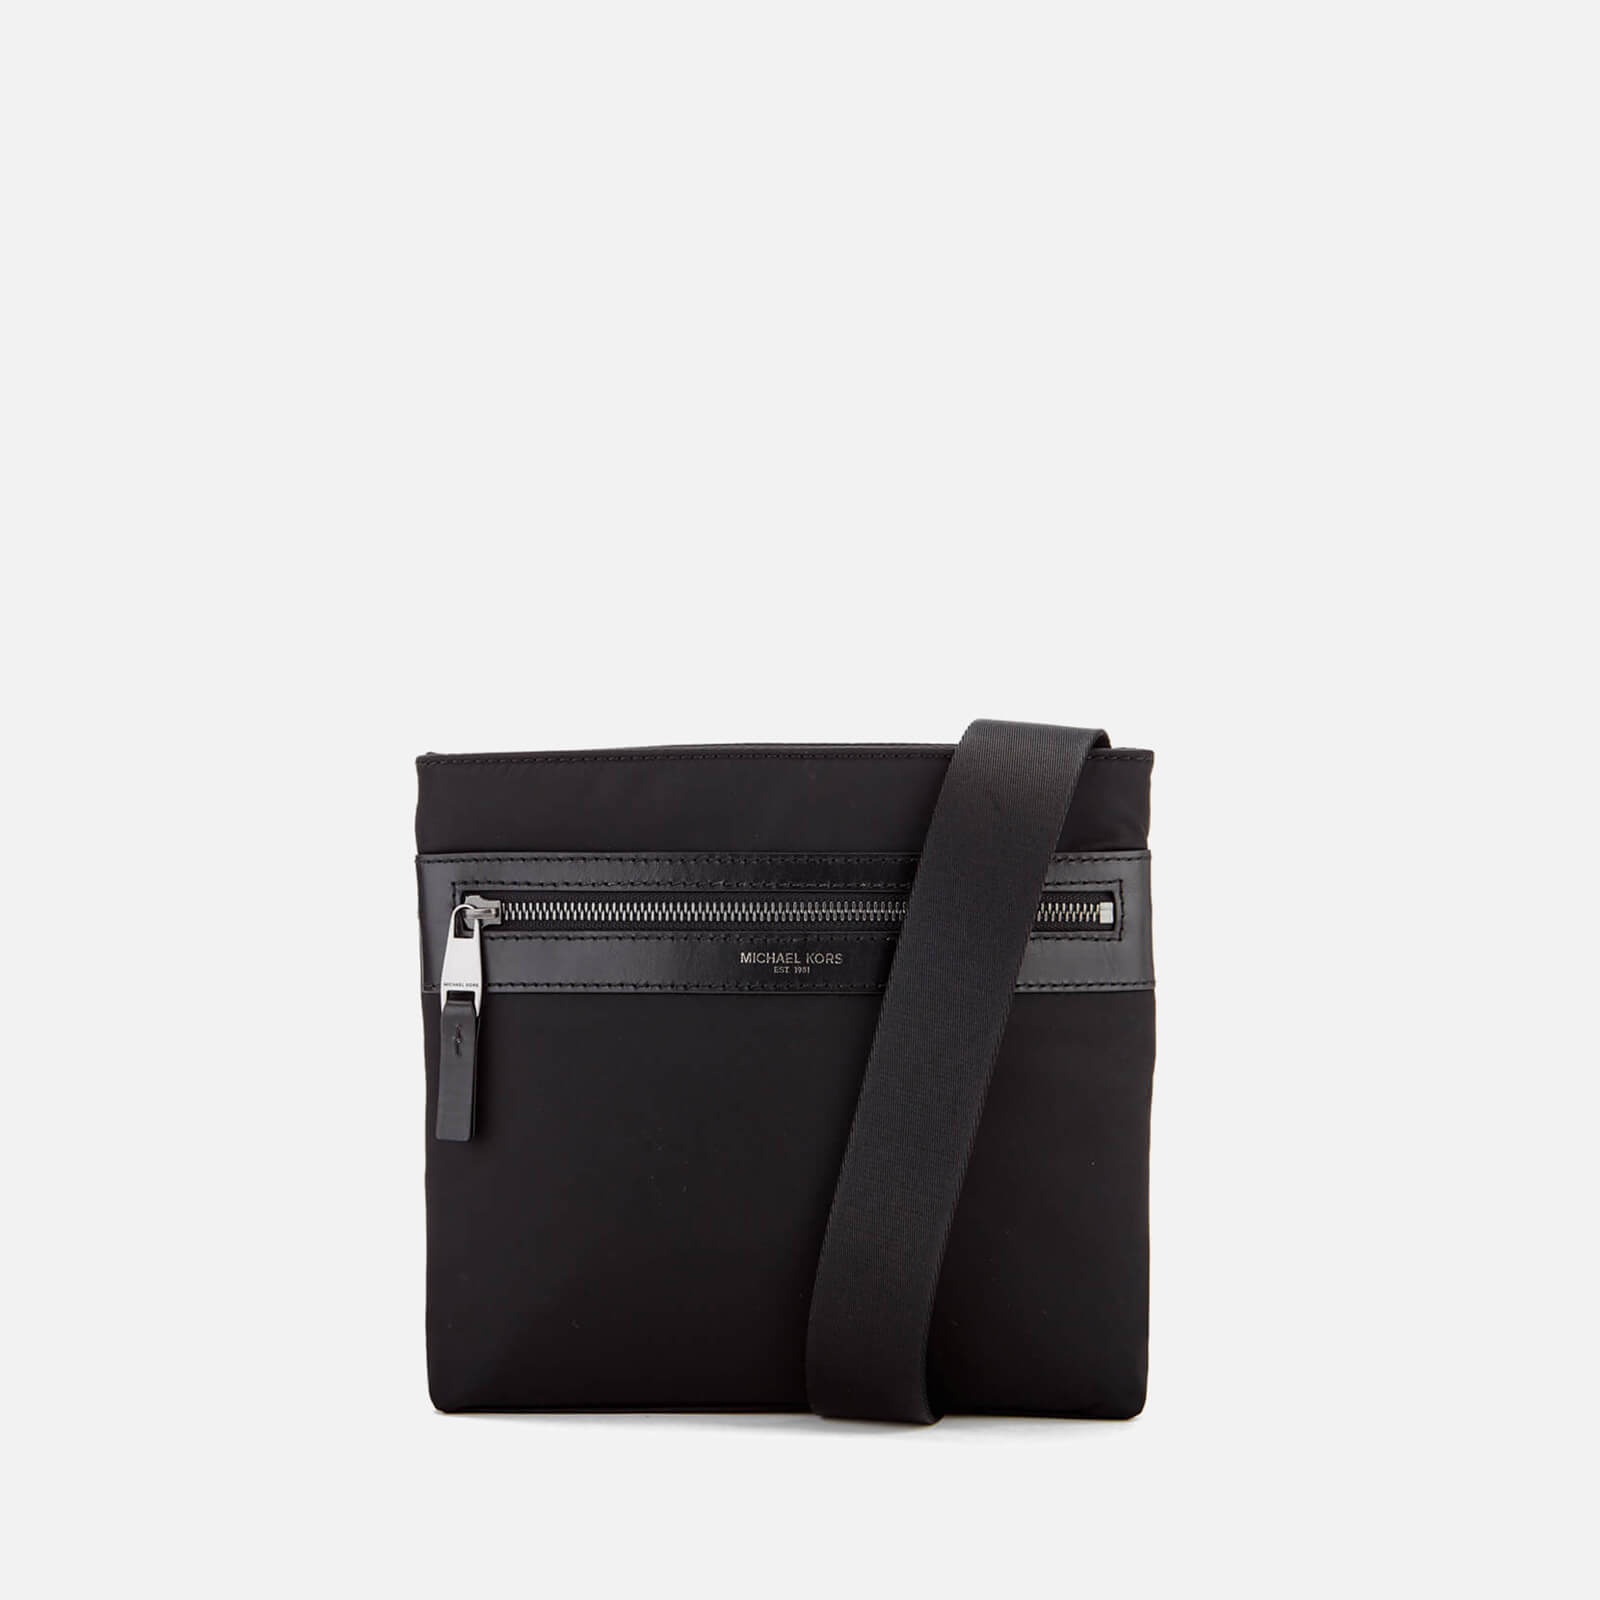 d4089b4a5c17 Michael Kors Men's Kent Cross Body Bag - Black - Free UK Delivery over £50